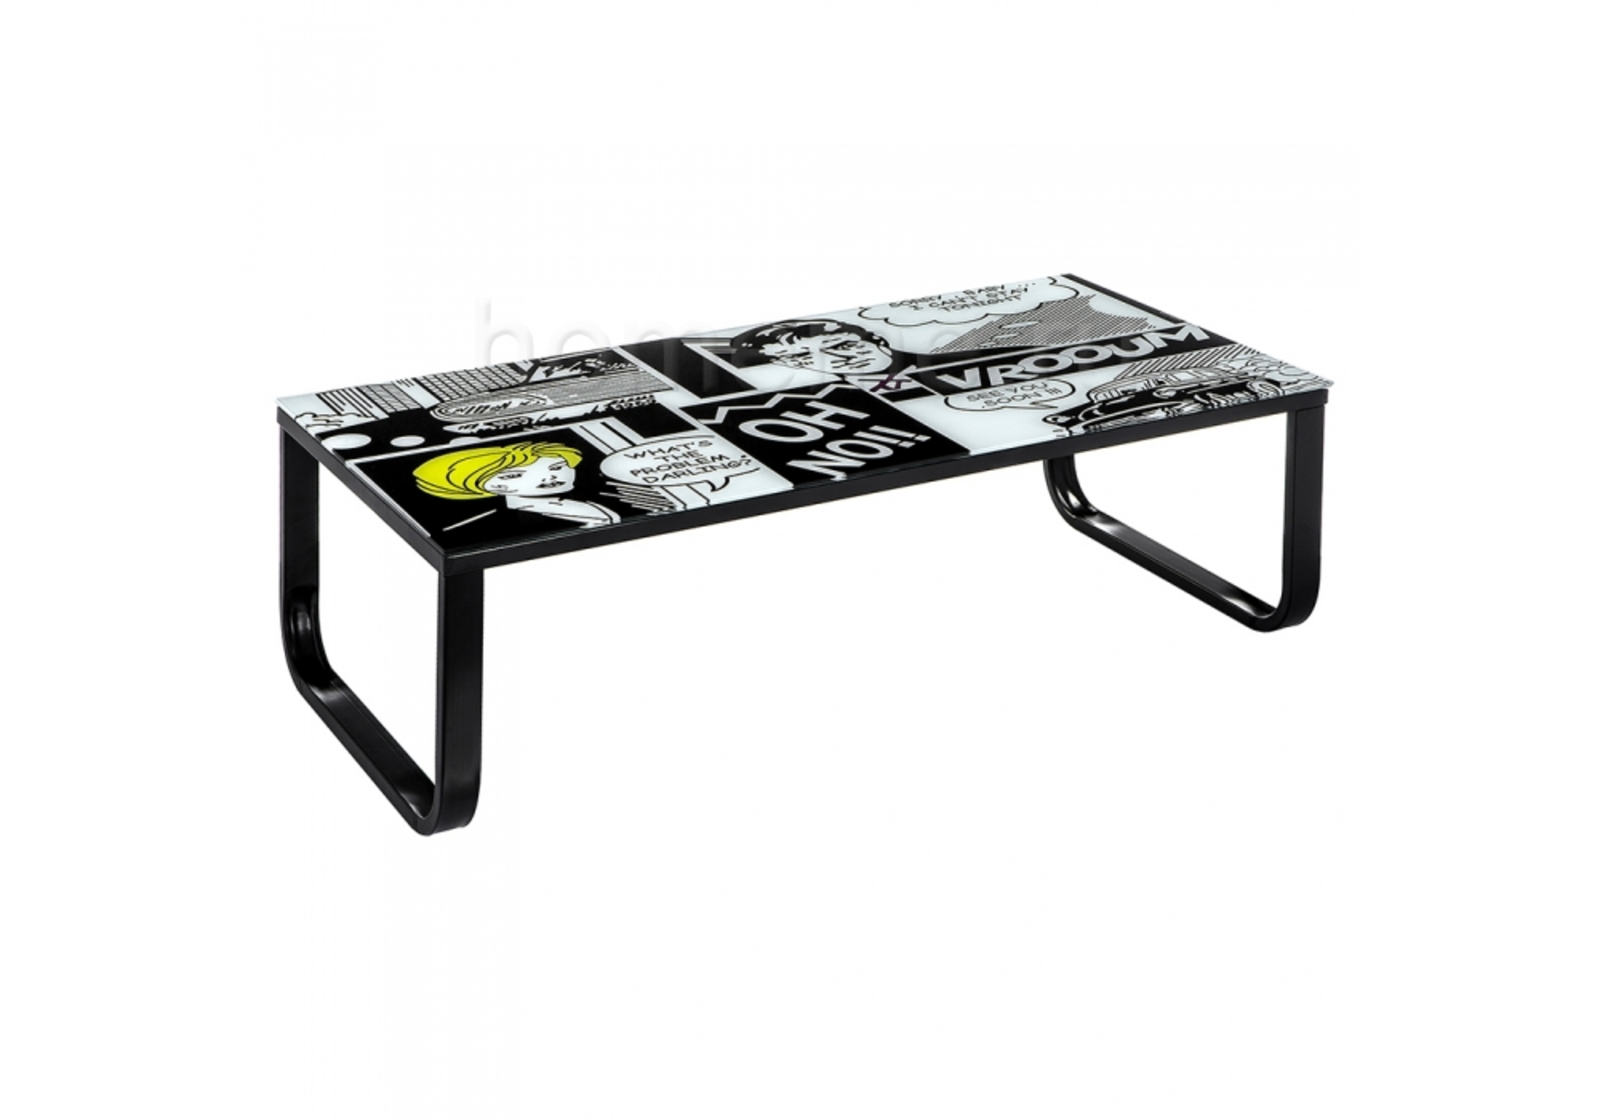 Журнальный стол Urban черный 11248 Urban черный 11248 (15927)